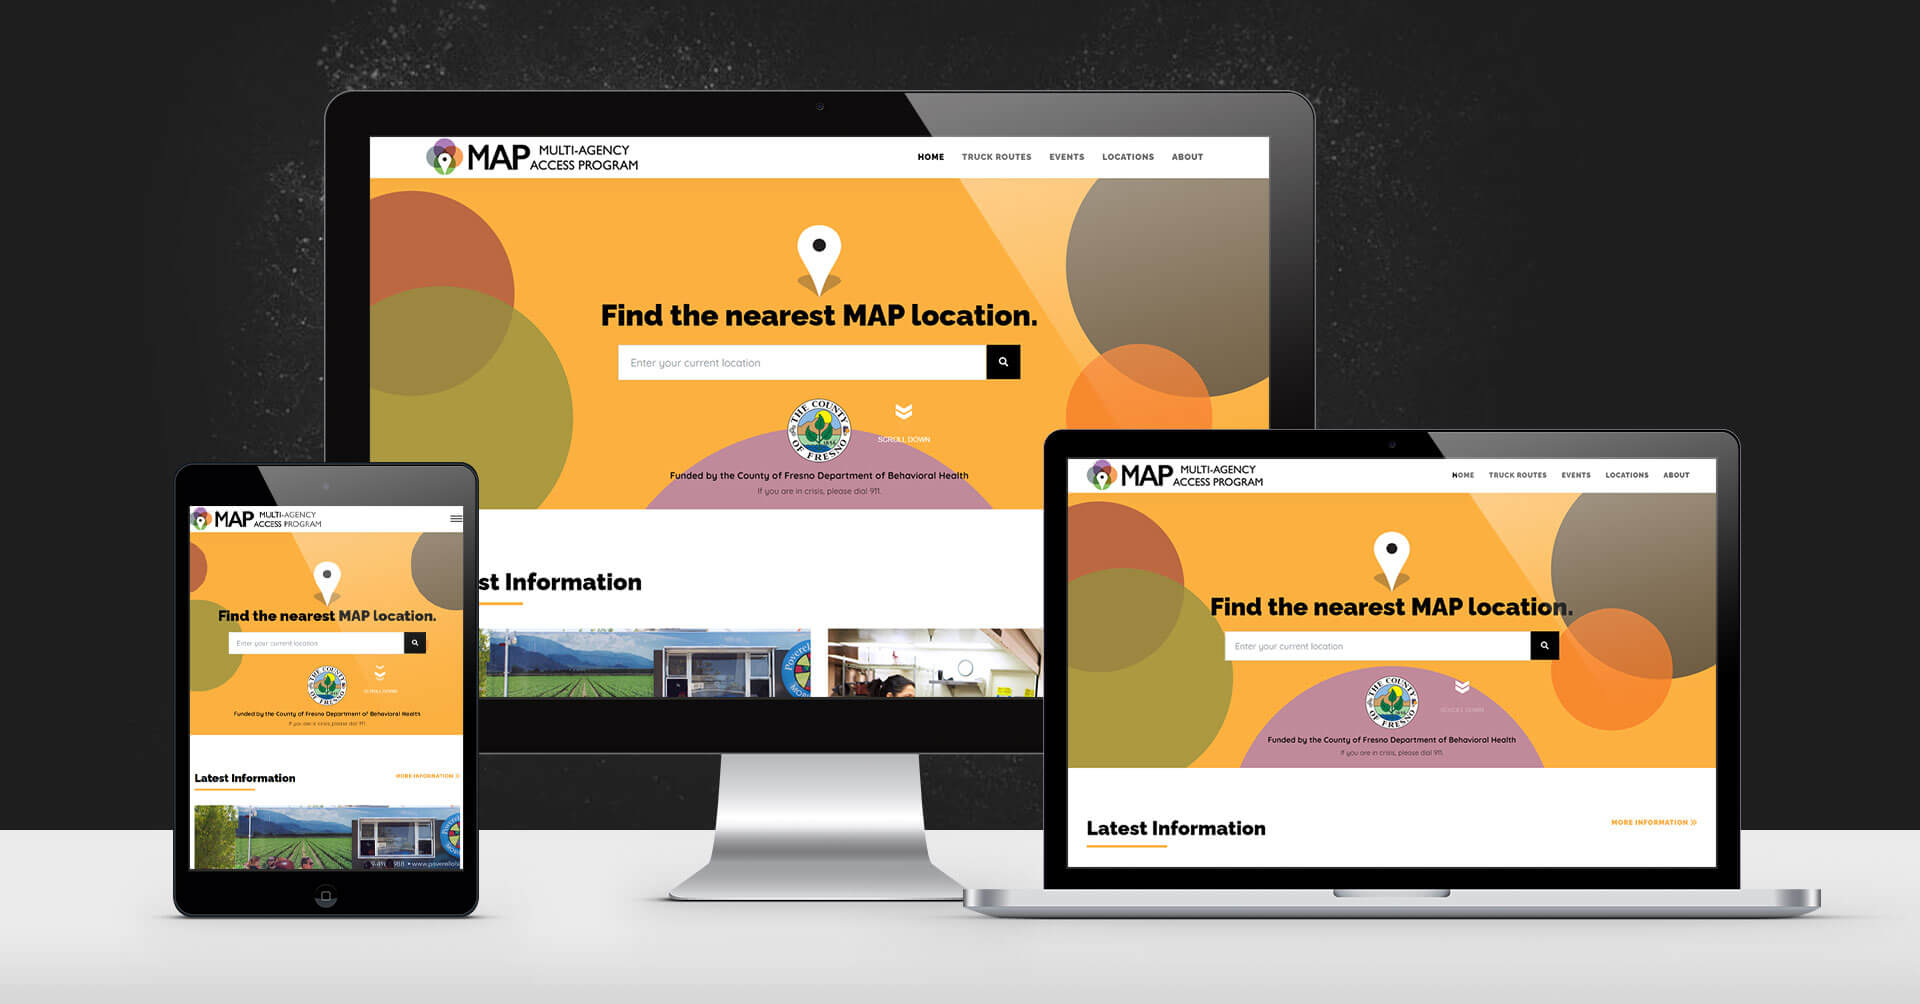 portfolio digital attic multi agency access program -devices